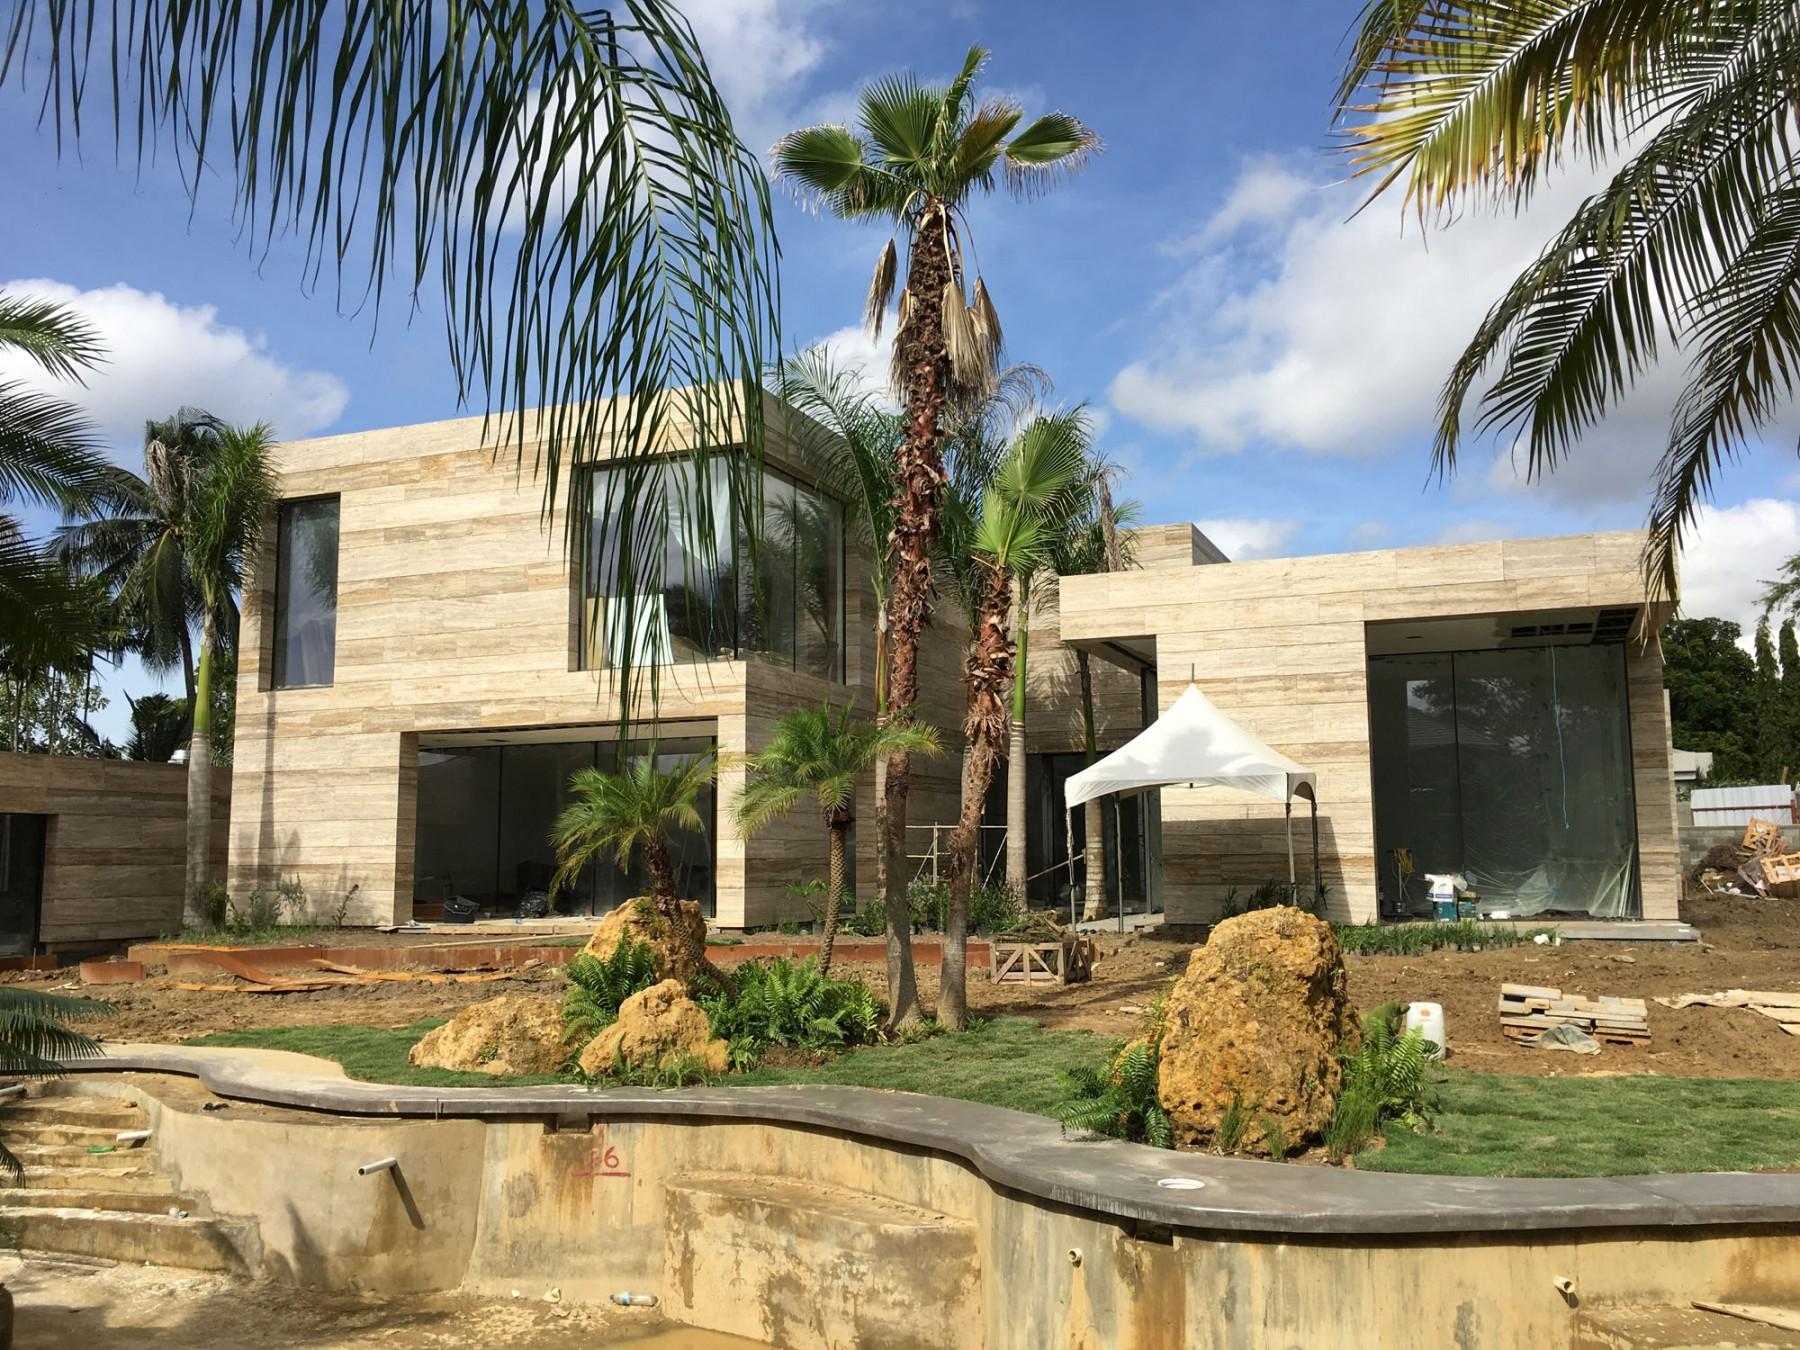 Family-house-port-of-spain-trinidad-jamie-fobert-architects-travertine-construction-lagoon